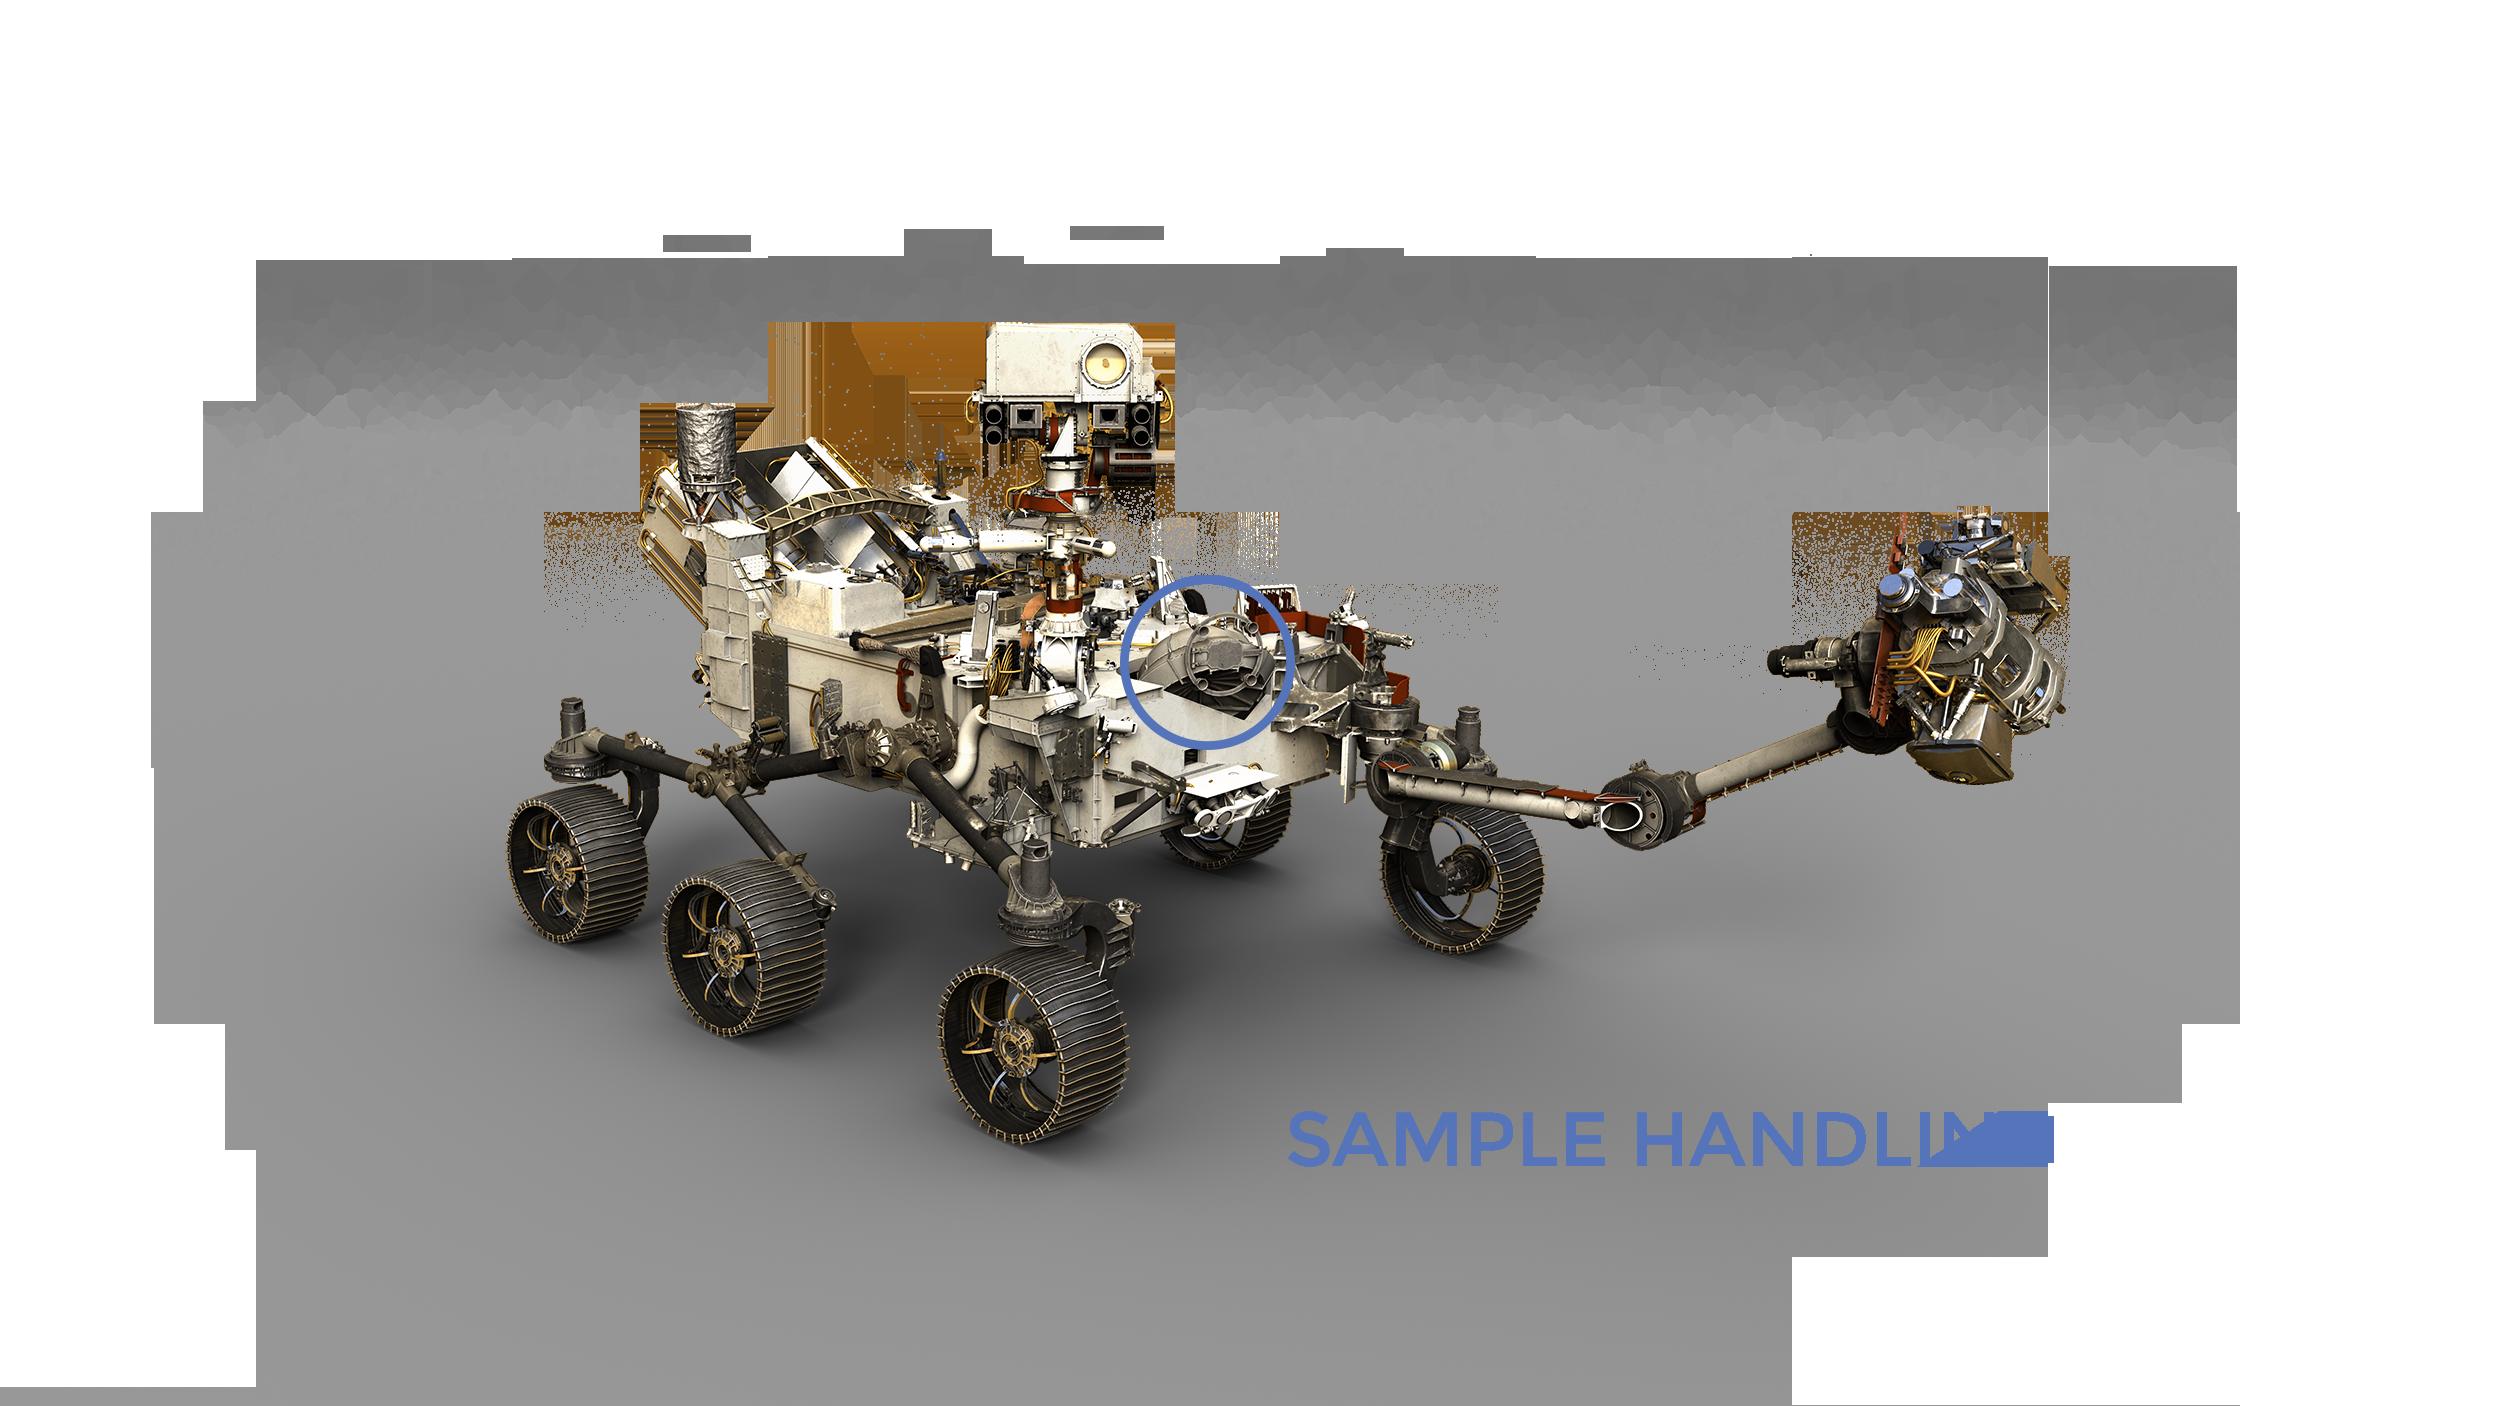 Mars 2020 Sample Handling